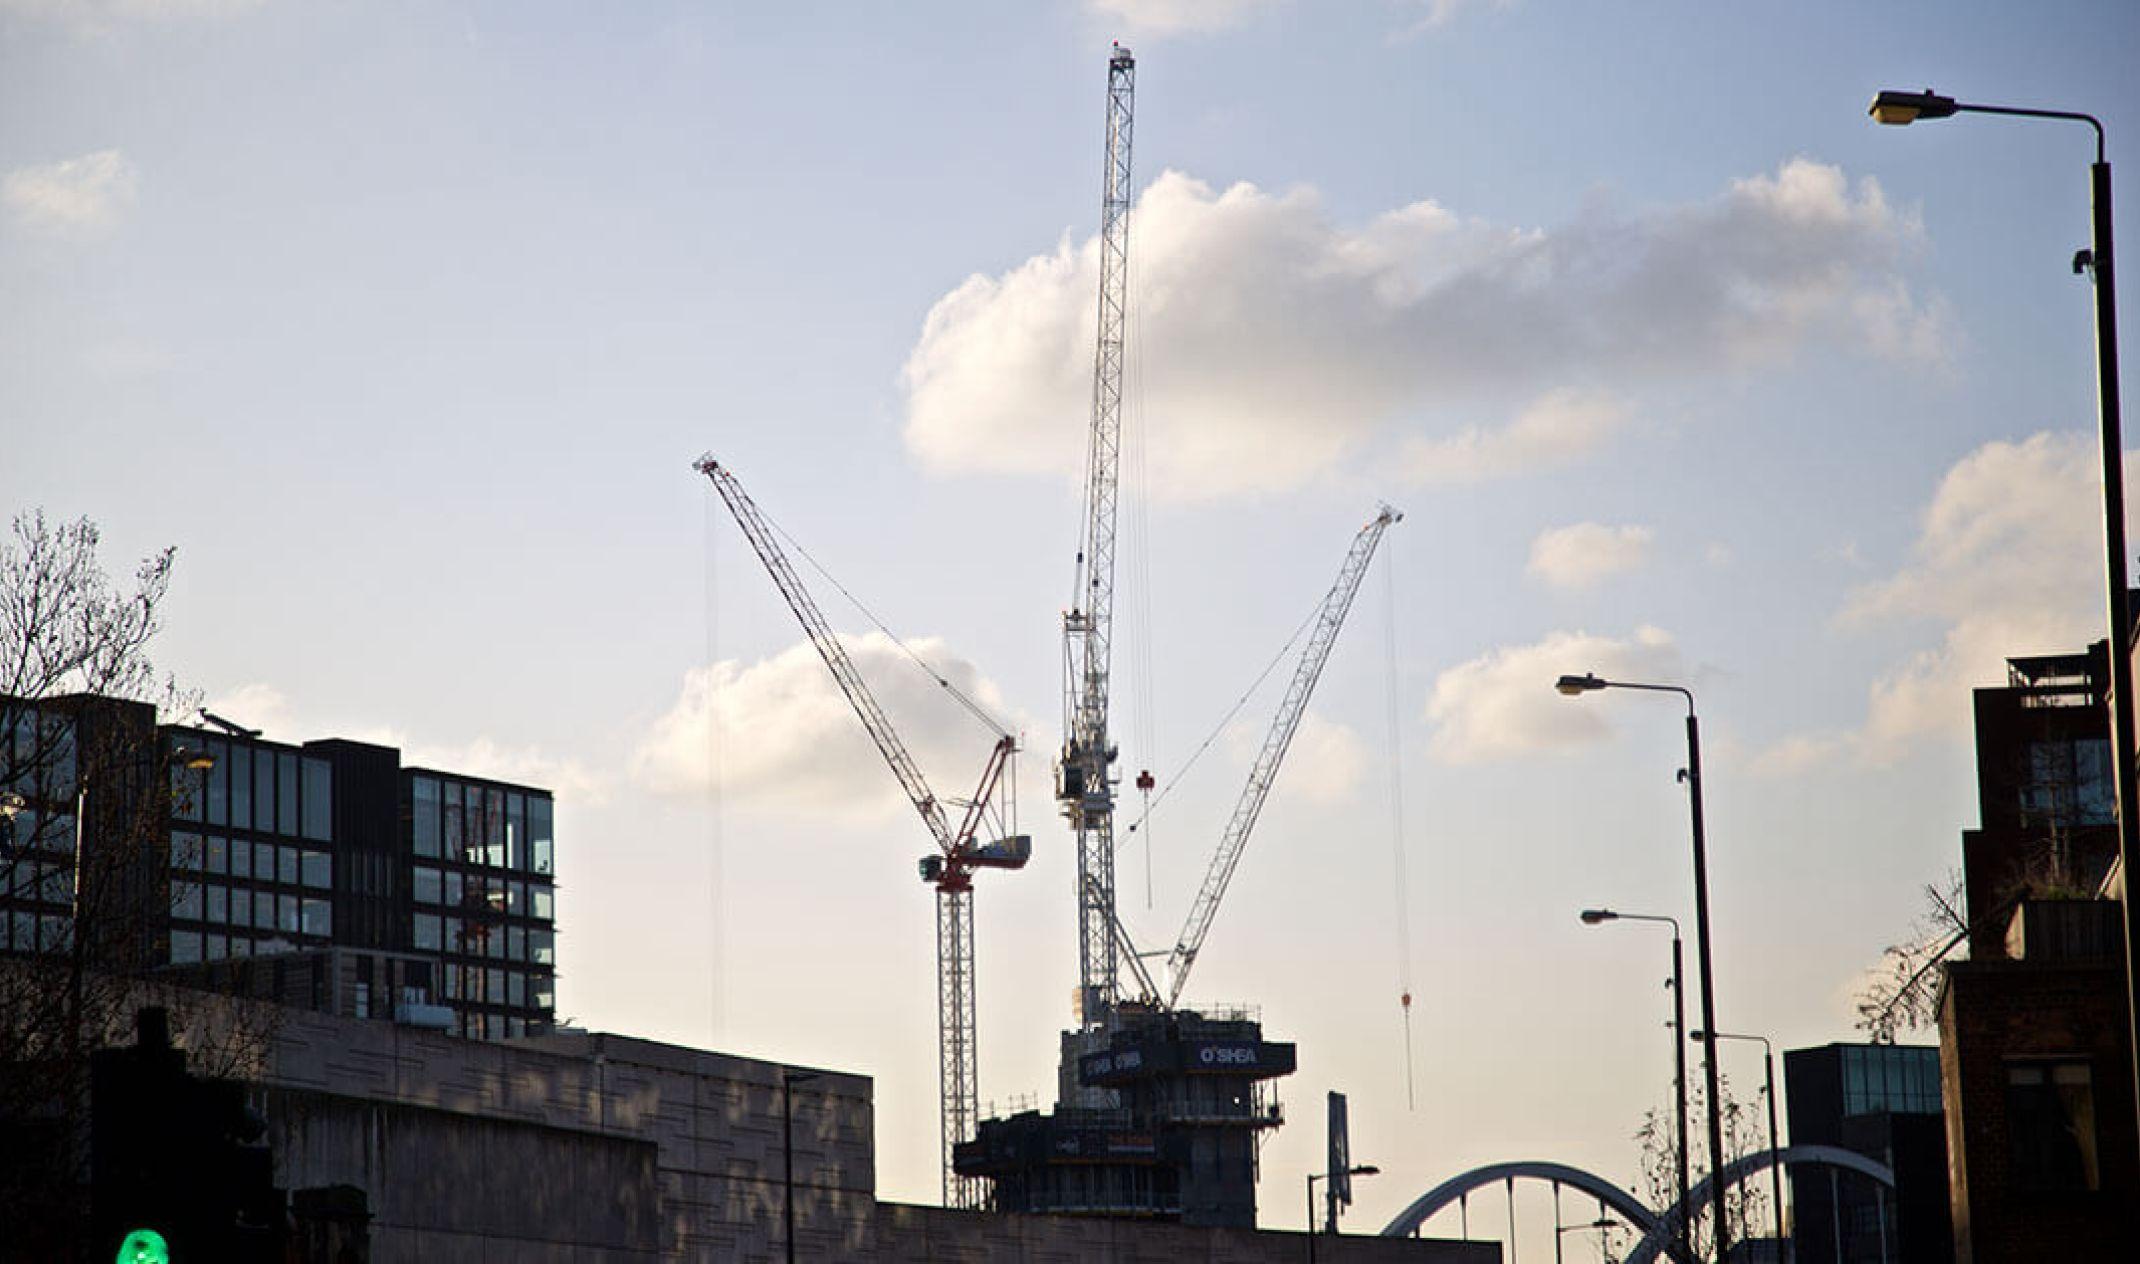 london skyline with three cranes